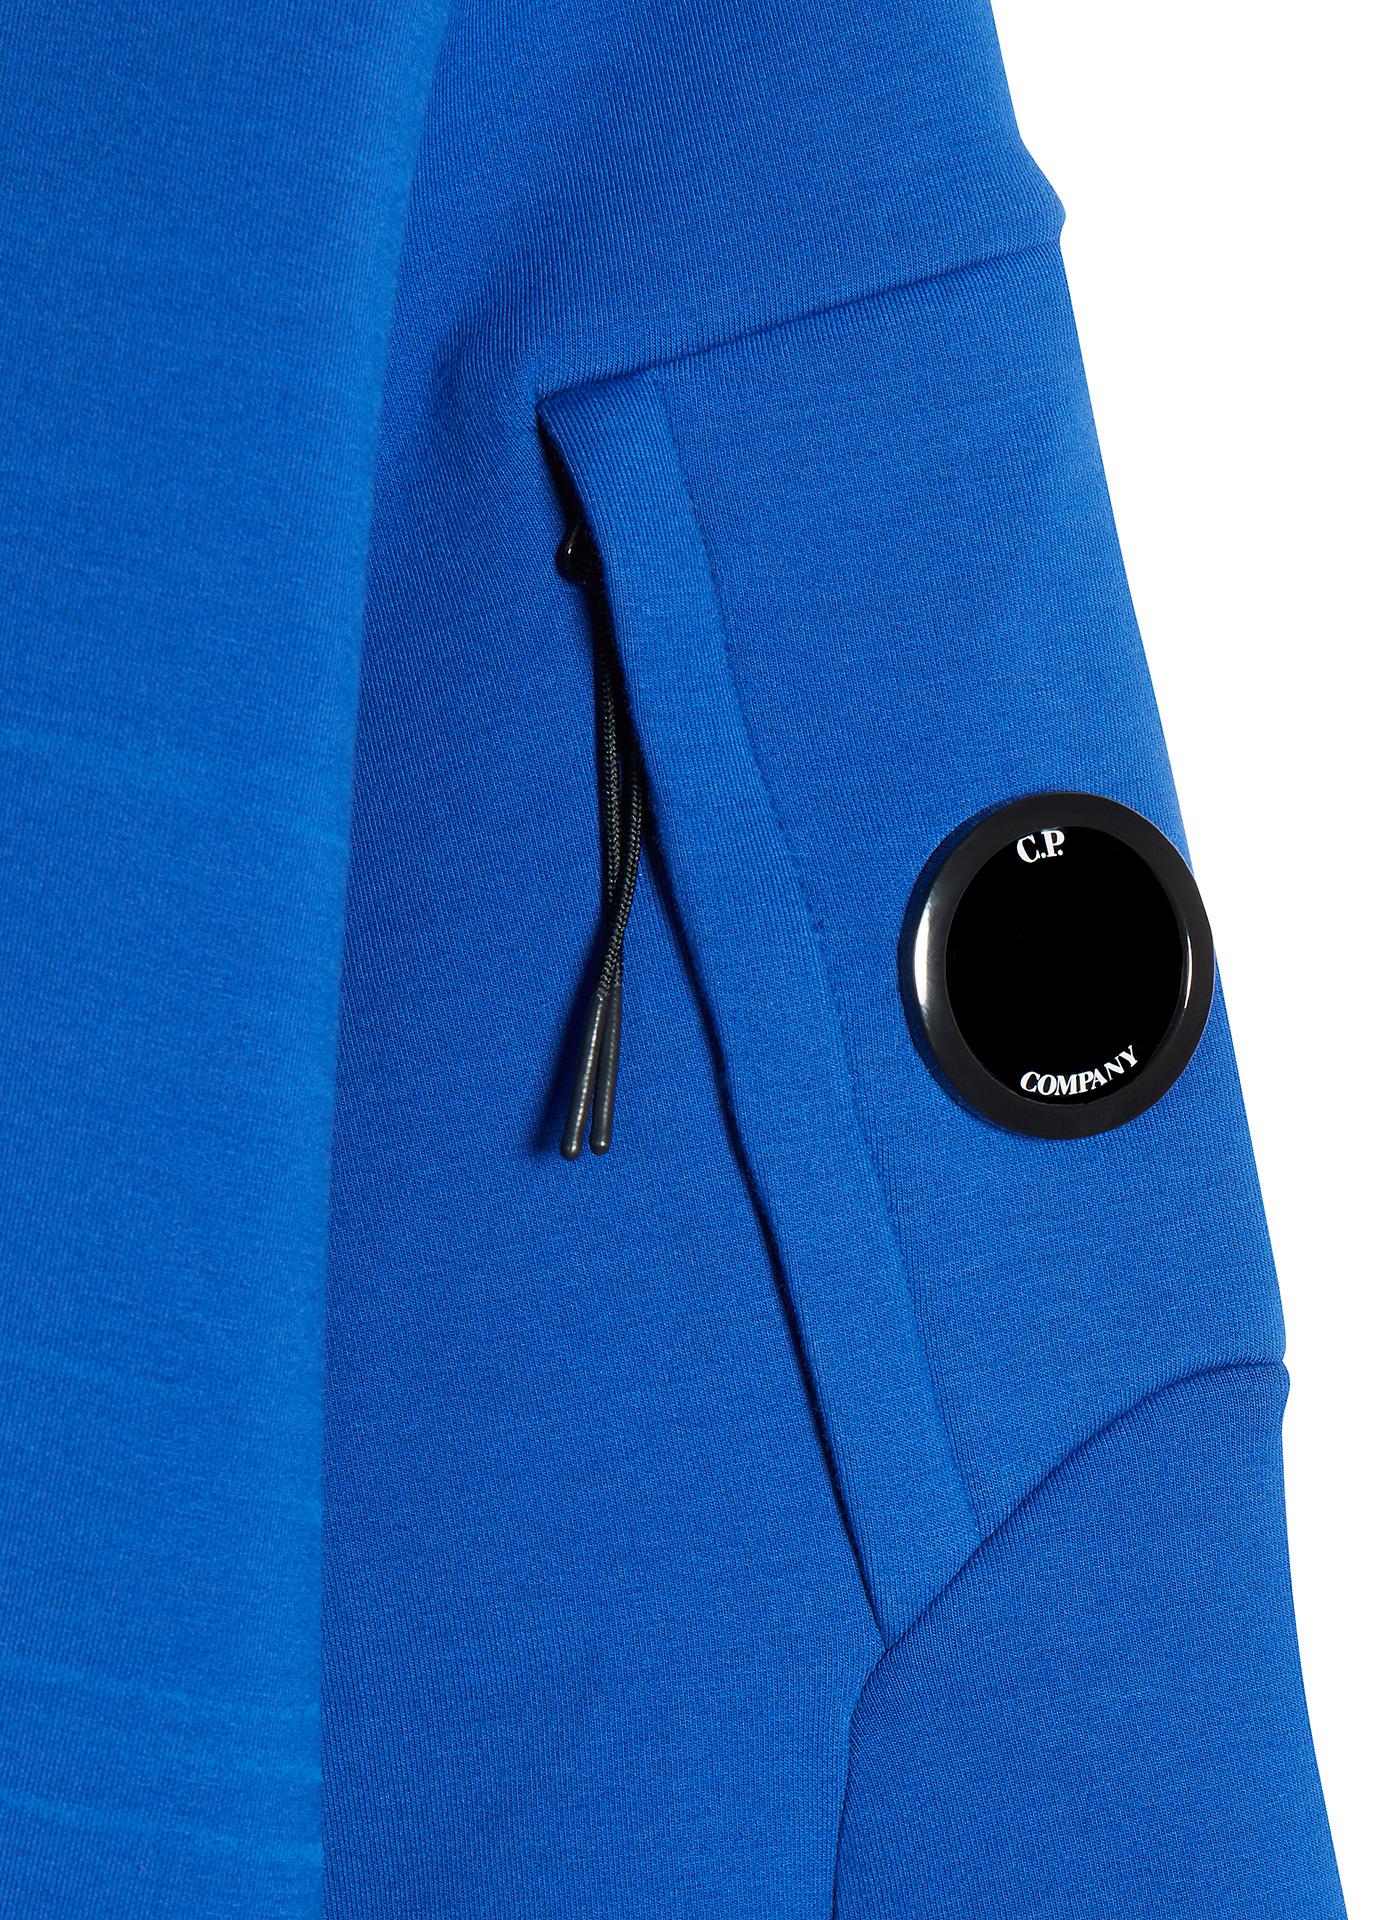 C.P. Company blue jumper detail shot